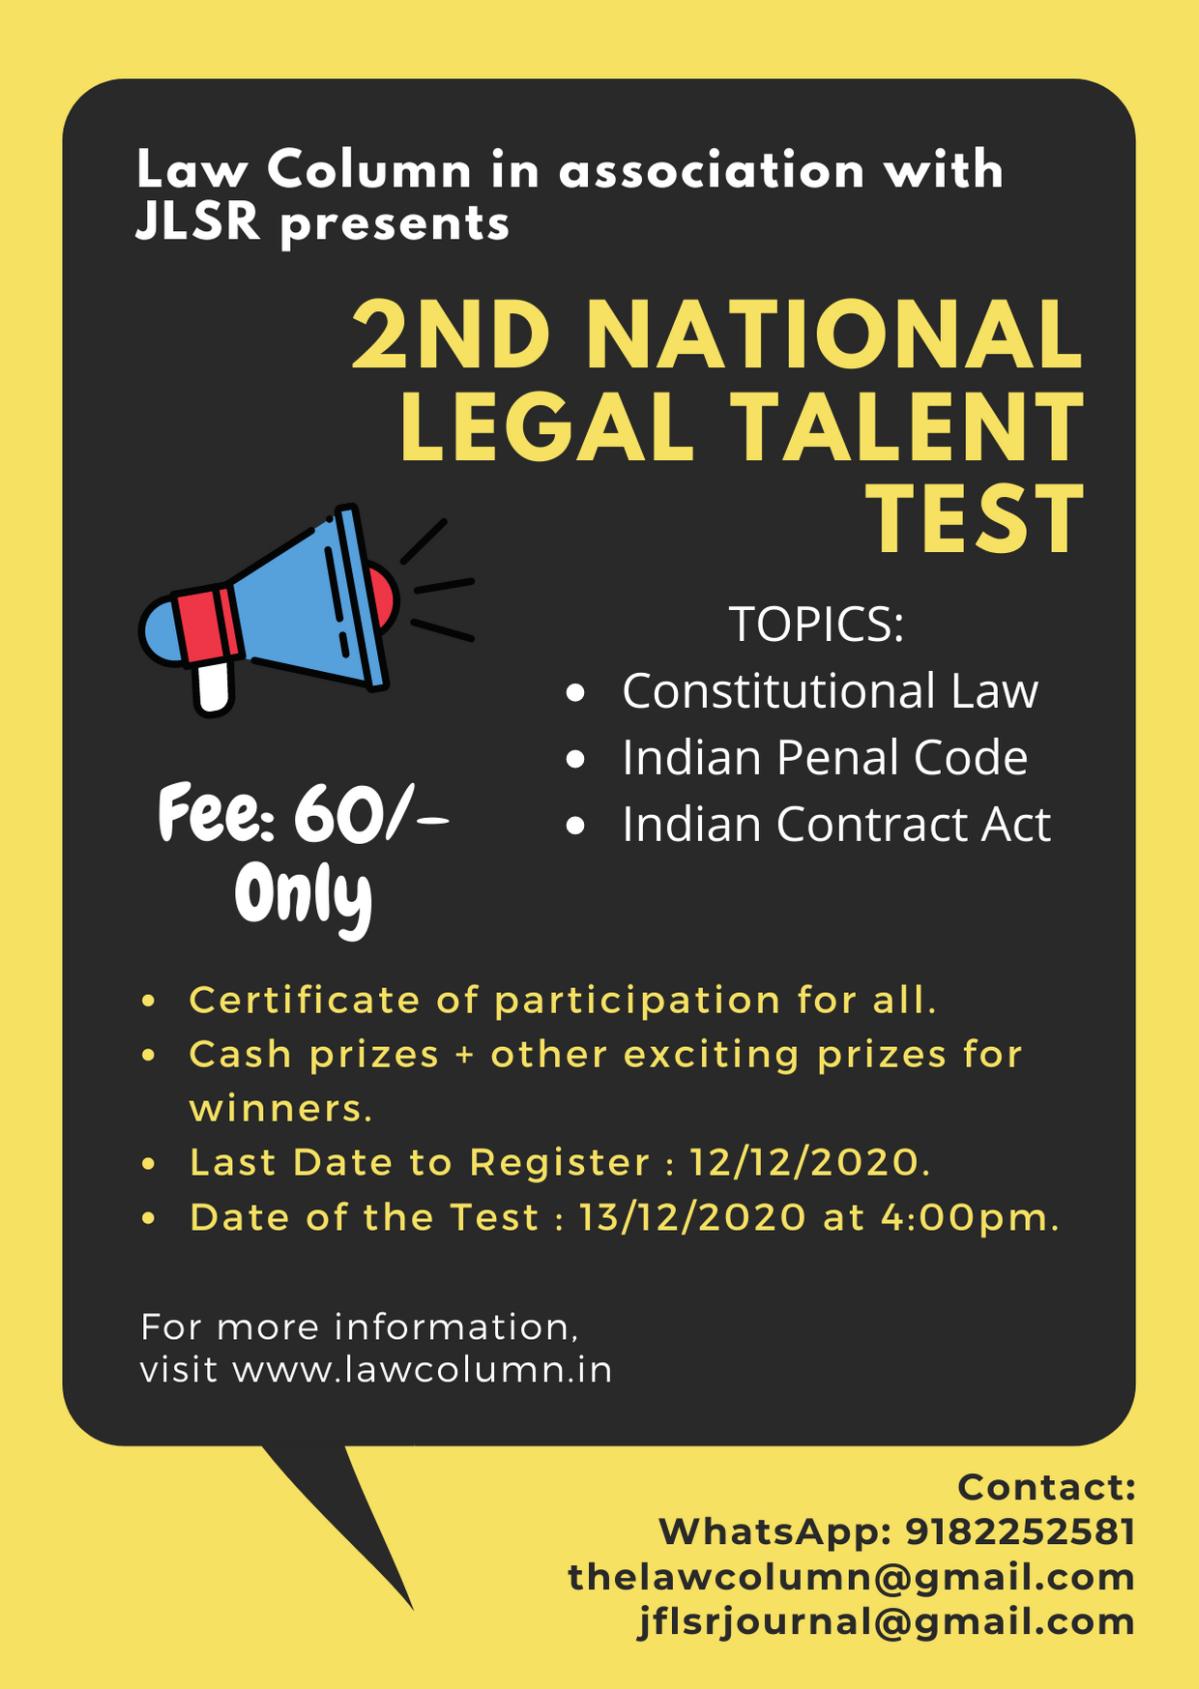 LAWCOLUMN'S NATIONAL LEGAL TALENT TEST IN ASSOCIATION WITH JLSR :REGISTERNOW!!!